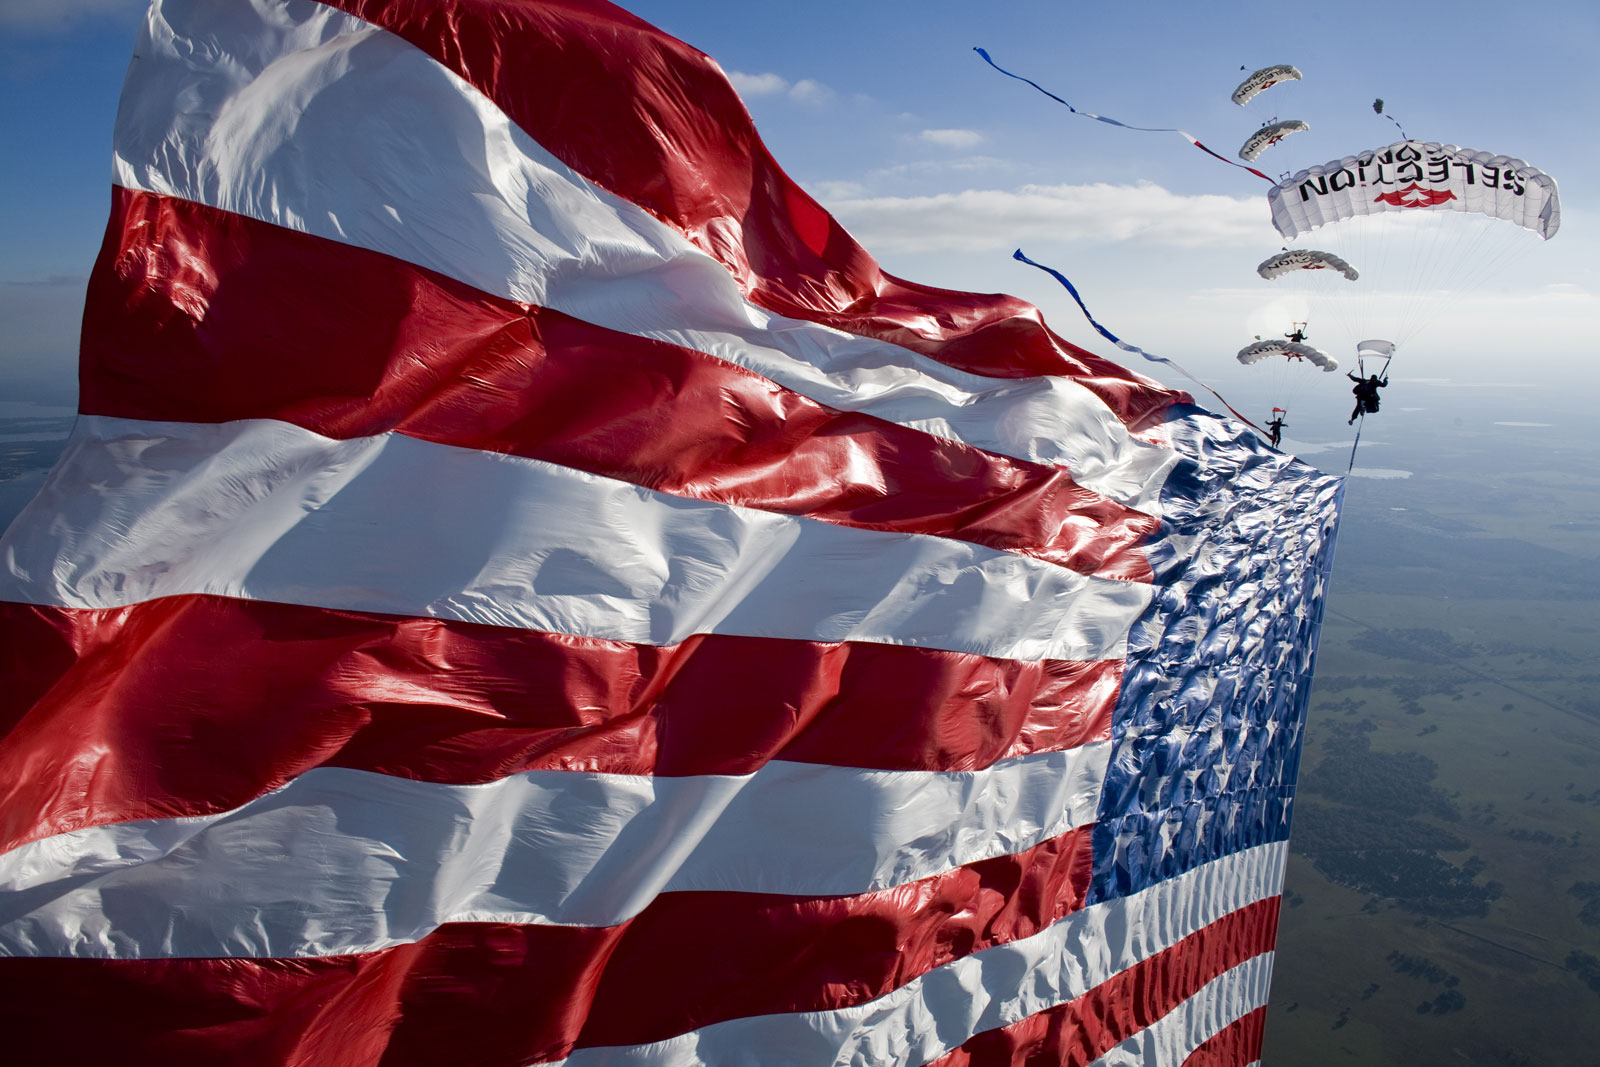 American Flag Skydive, background checks